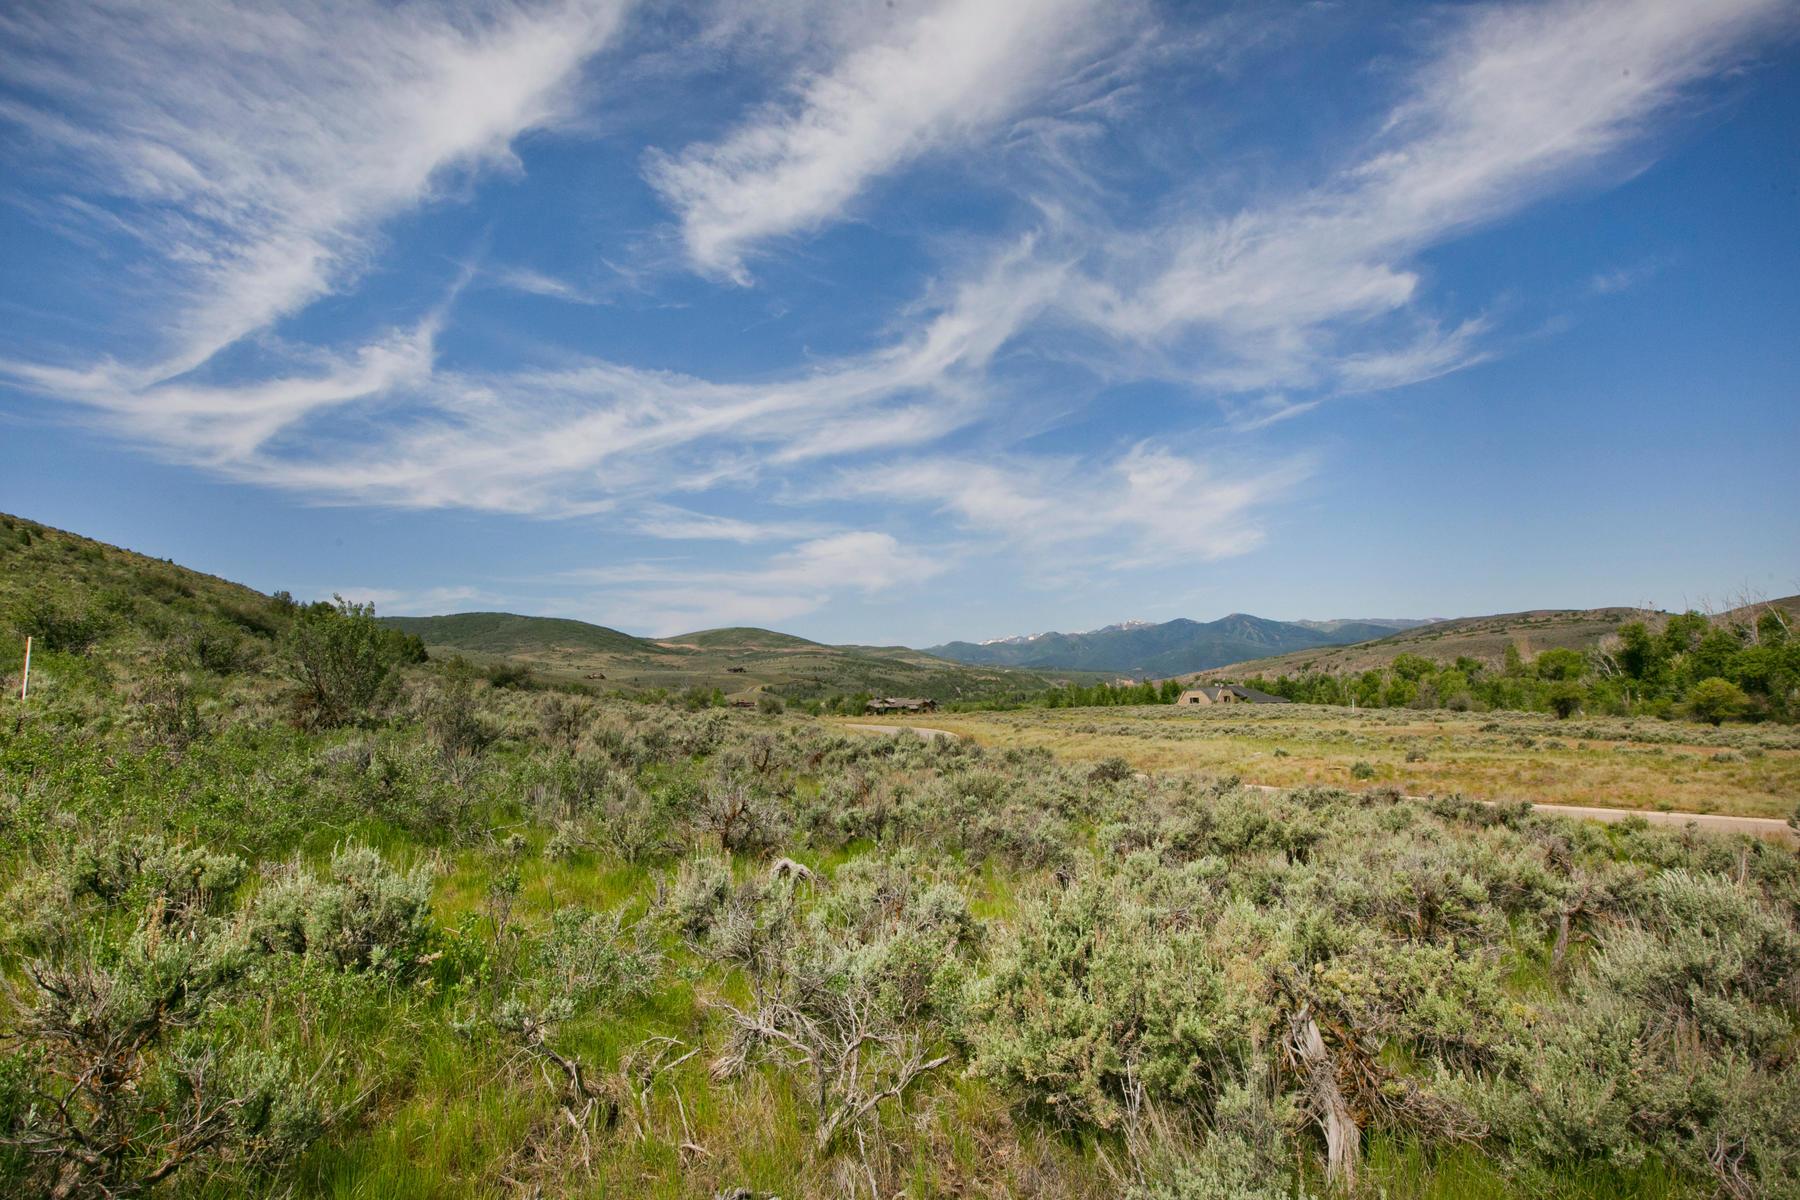 Terreno por un Venta en Victory Ranch Home Site Walk to the River 6800 E Cliff View Ct Heber City, Utah, 84032 Estados Unidos